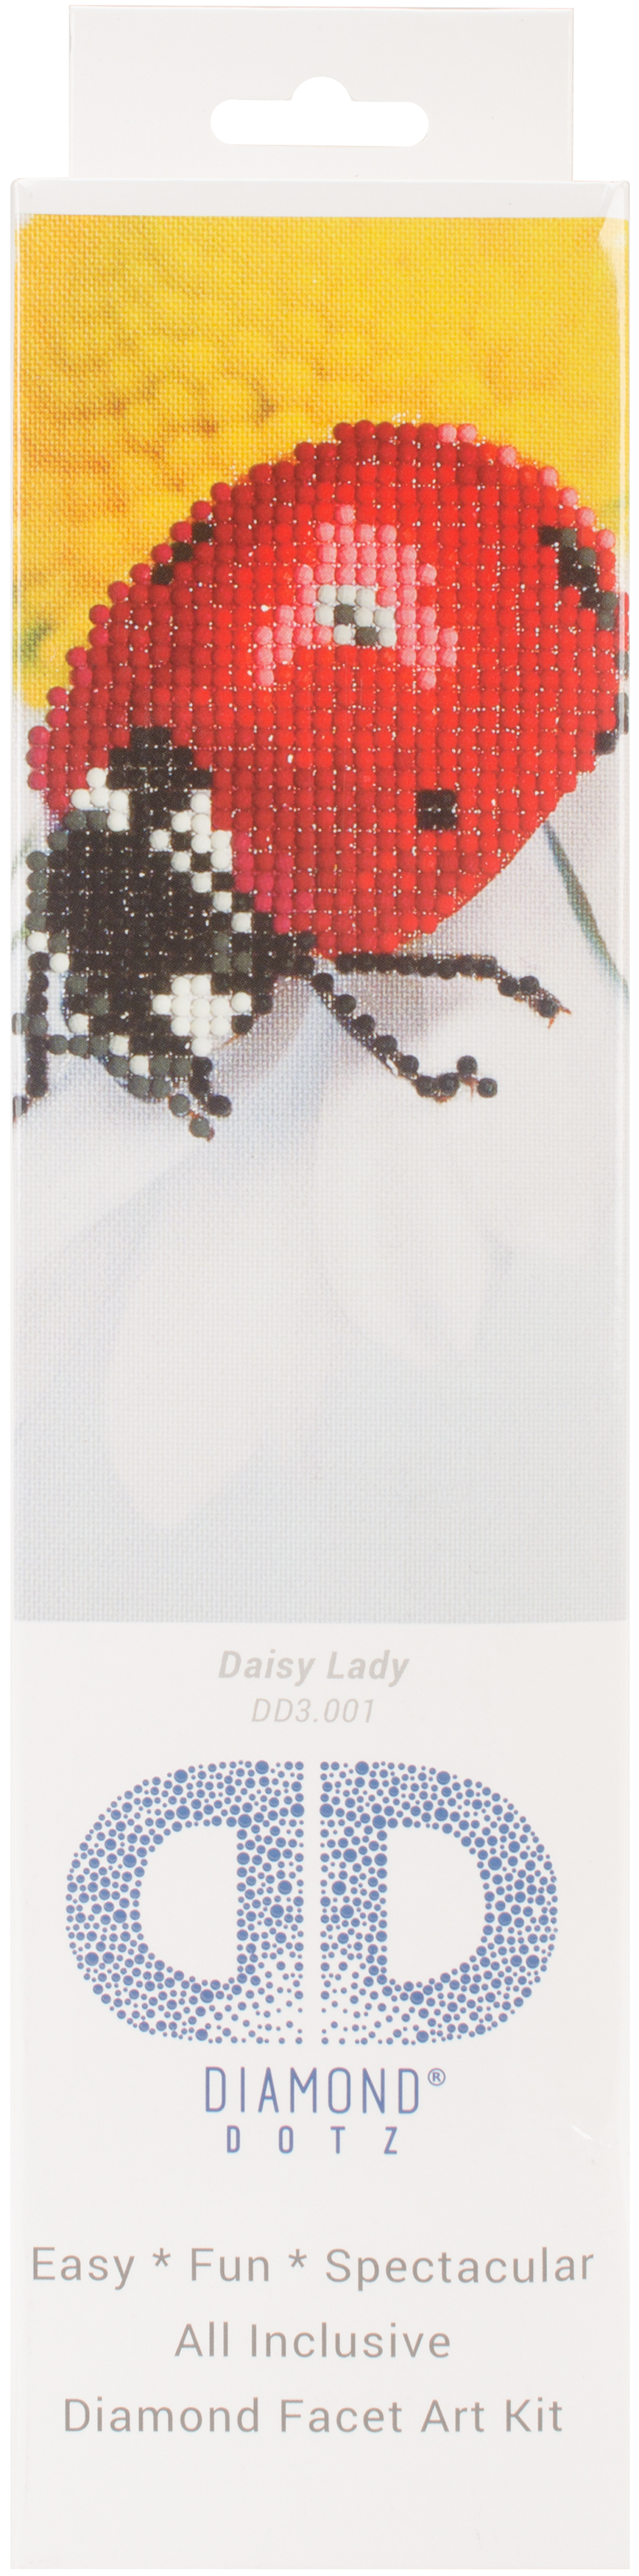 Diamond Dotz Diamond Embroidery Facet Art Kit 9.75X9.75-Daisy Lady